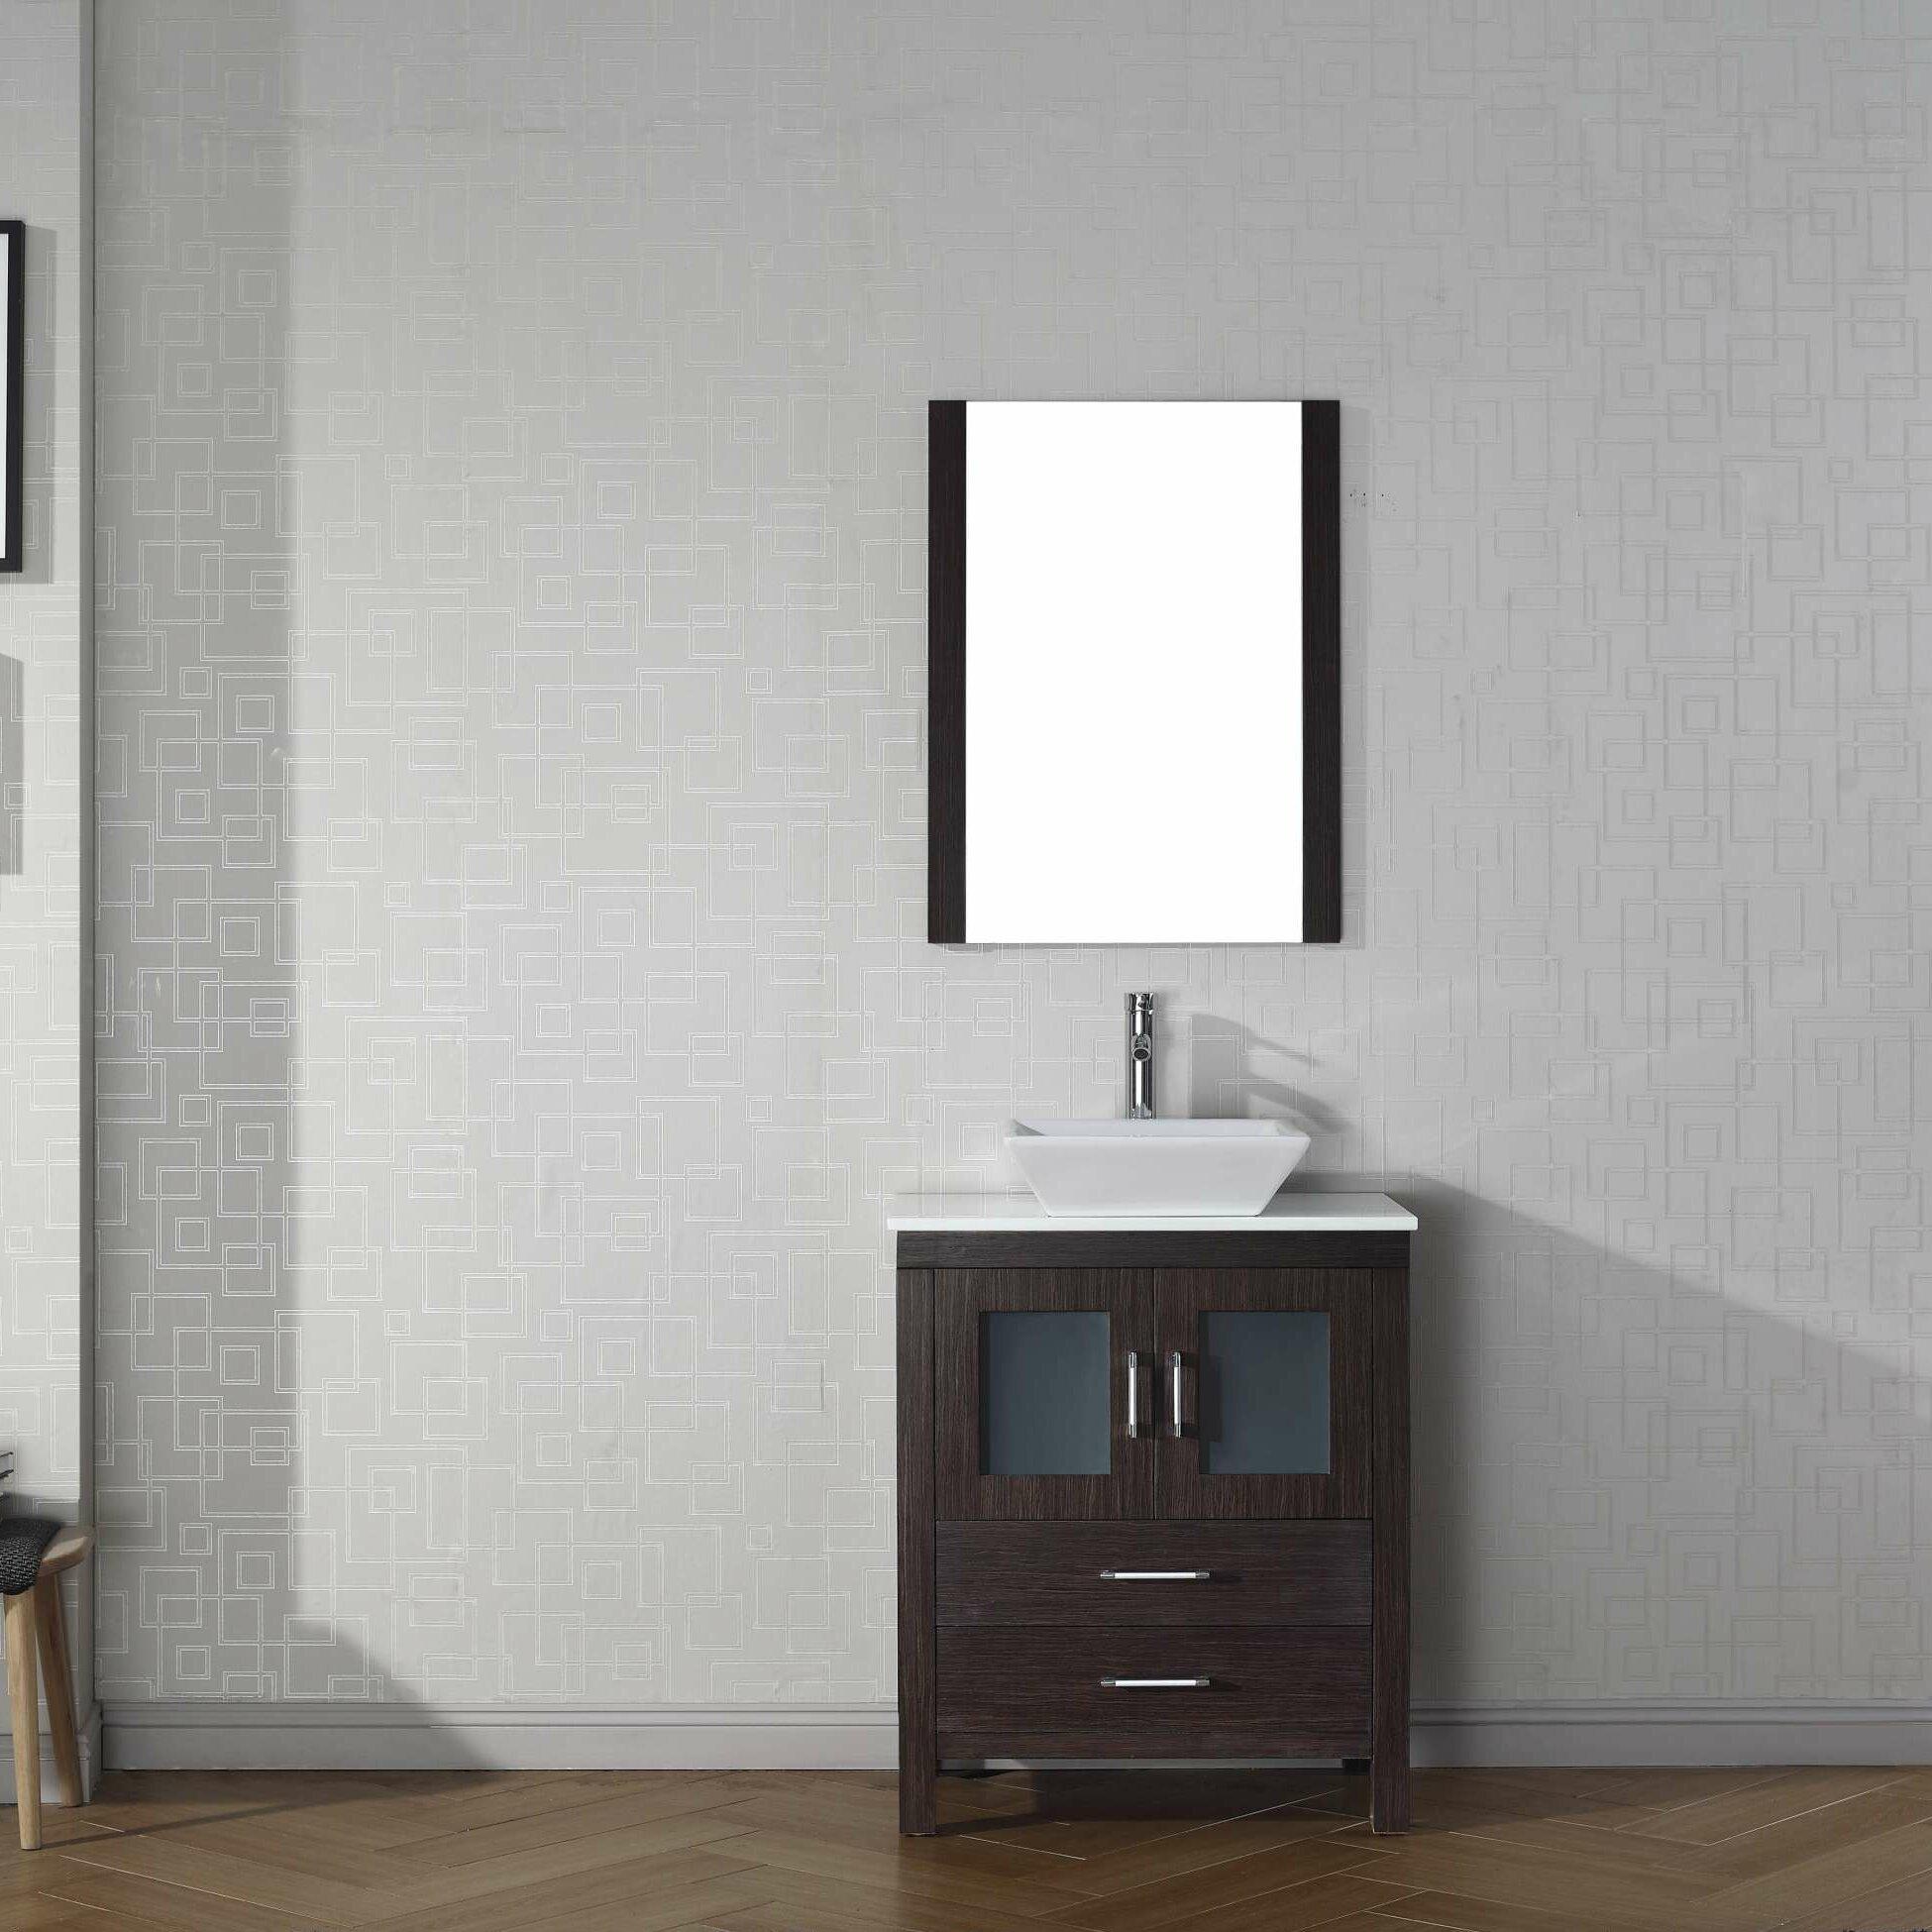 Virtu dior 28 single bathroom vanity set with mirror for Bathroom mirror set